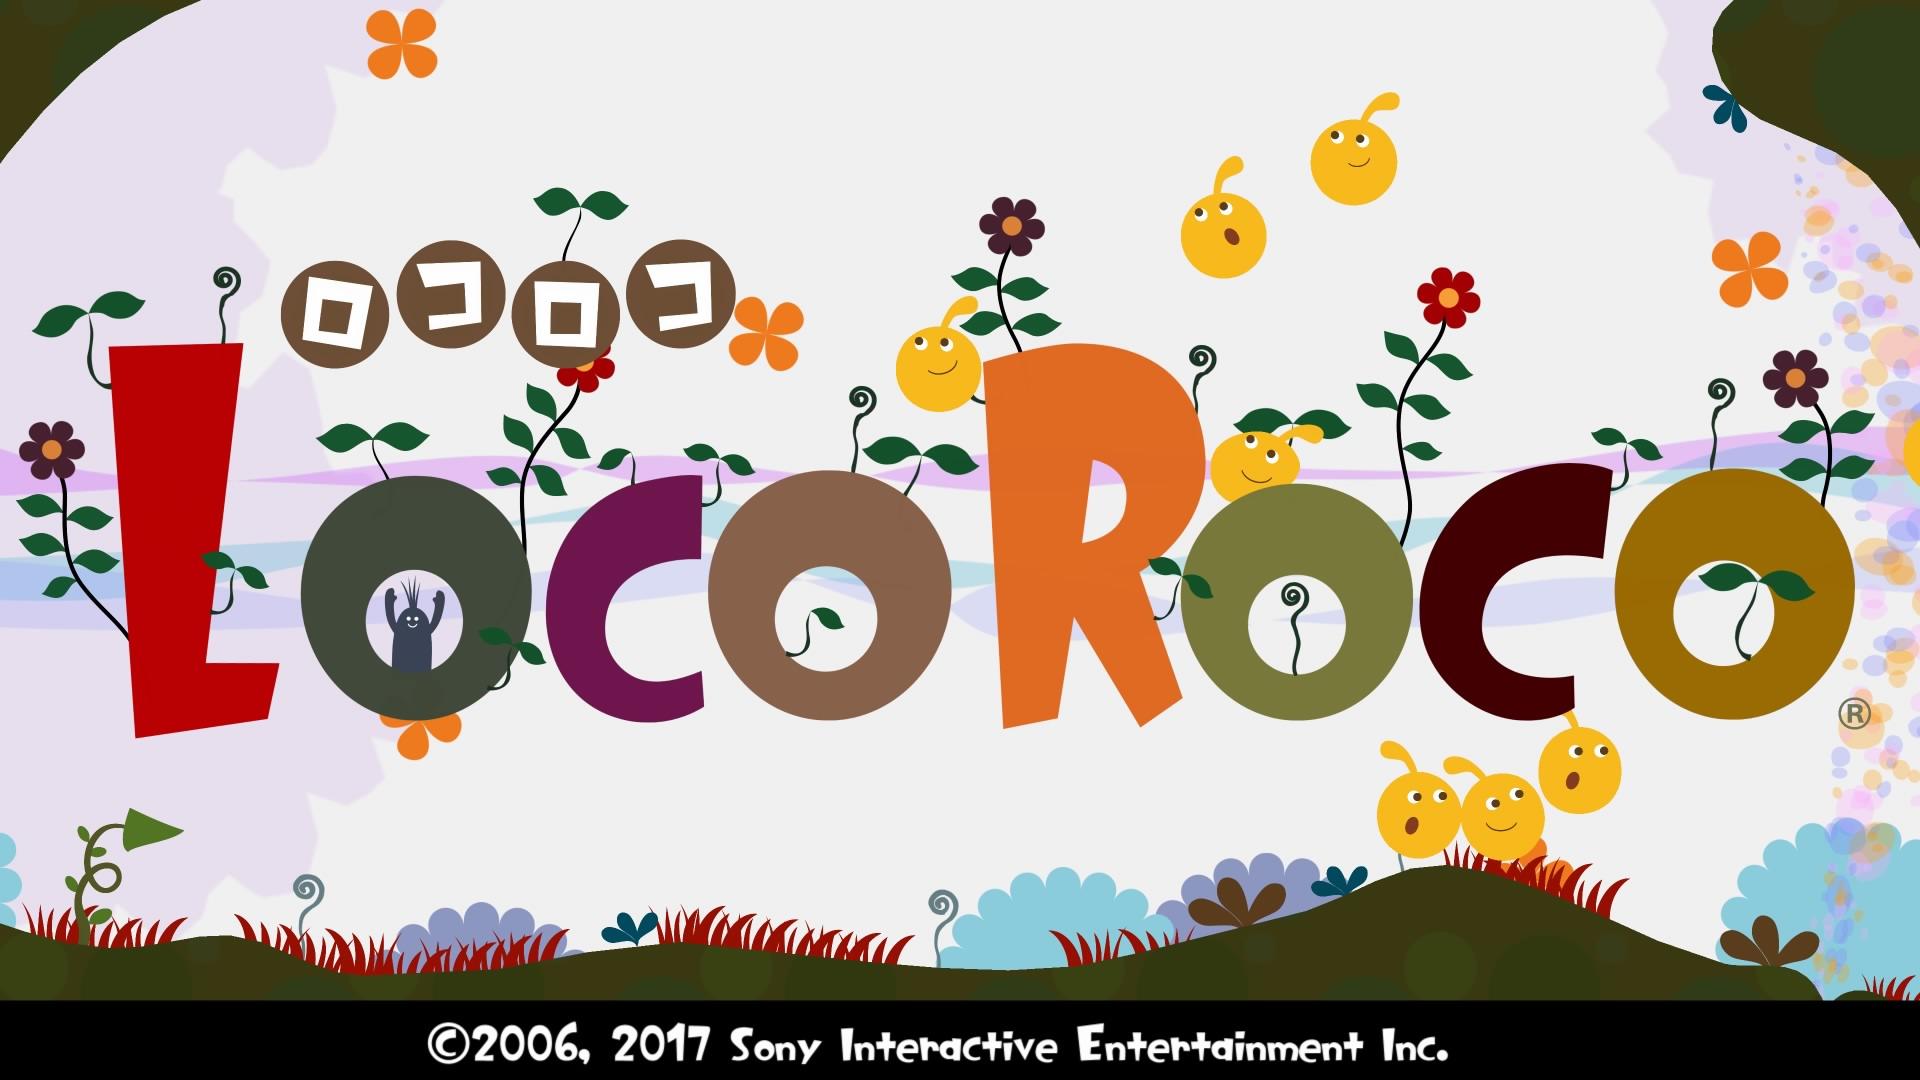 LOCOROCO(PSP)(PS4)感想・レビュー